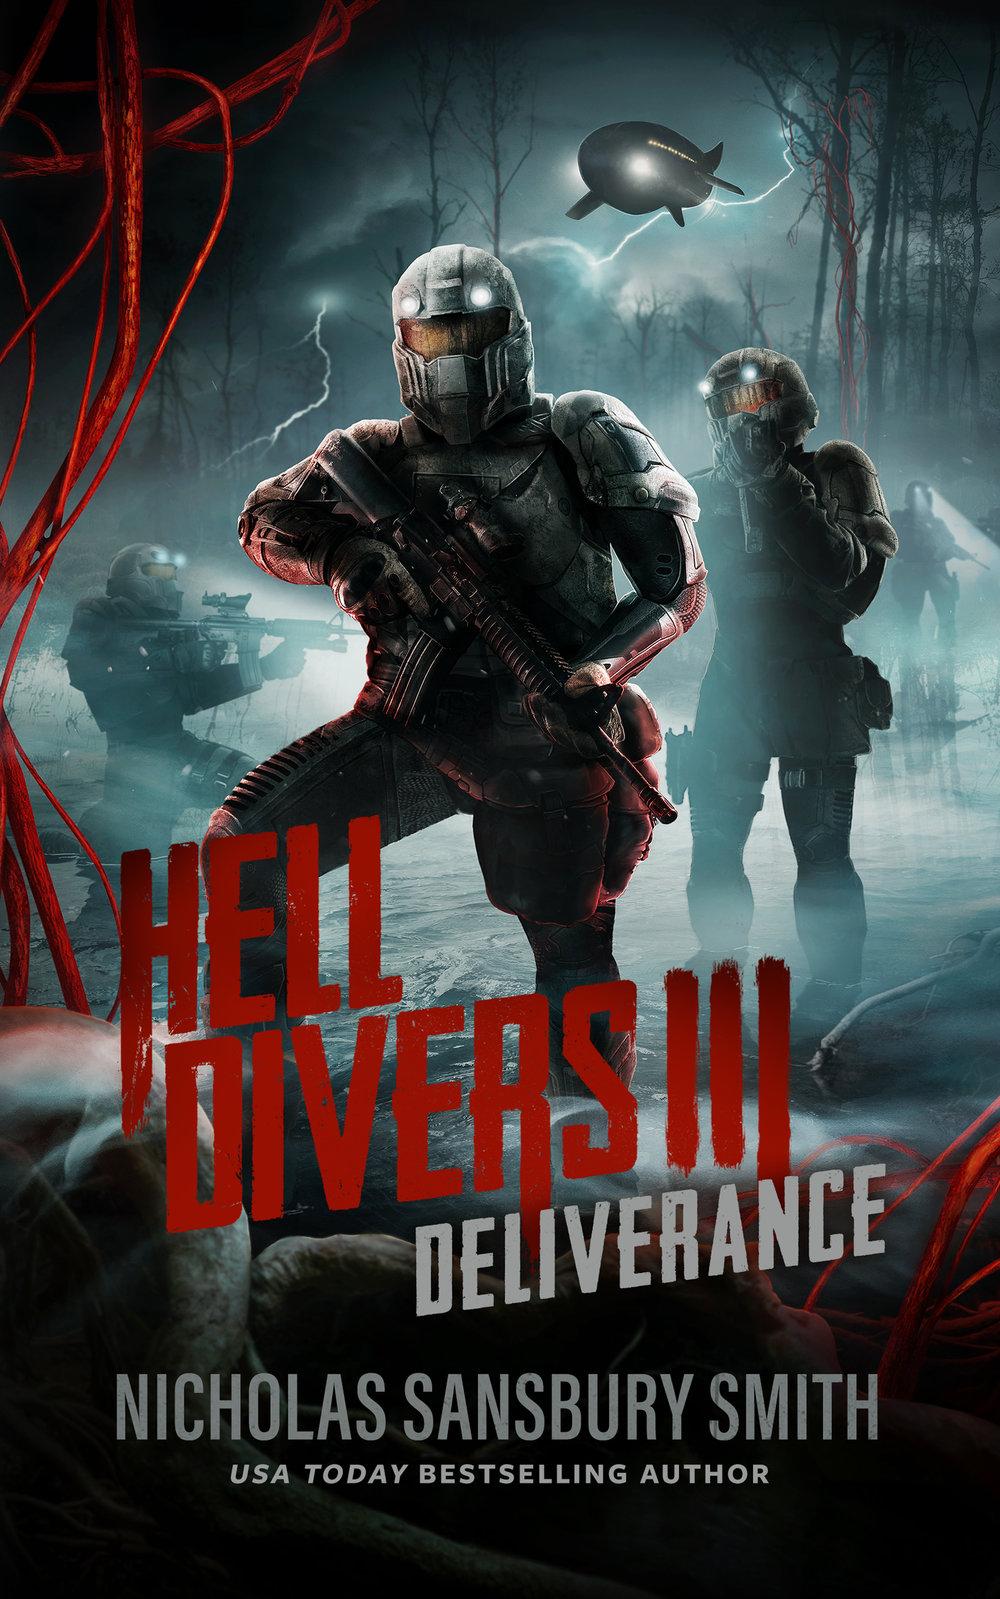 hell divers iii deliverance_nicholas sansbury smith.jpg